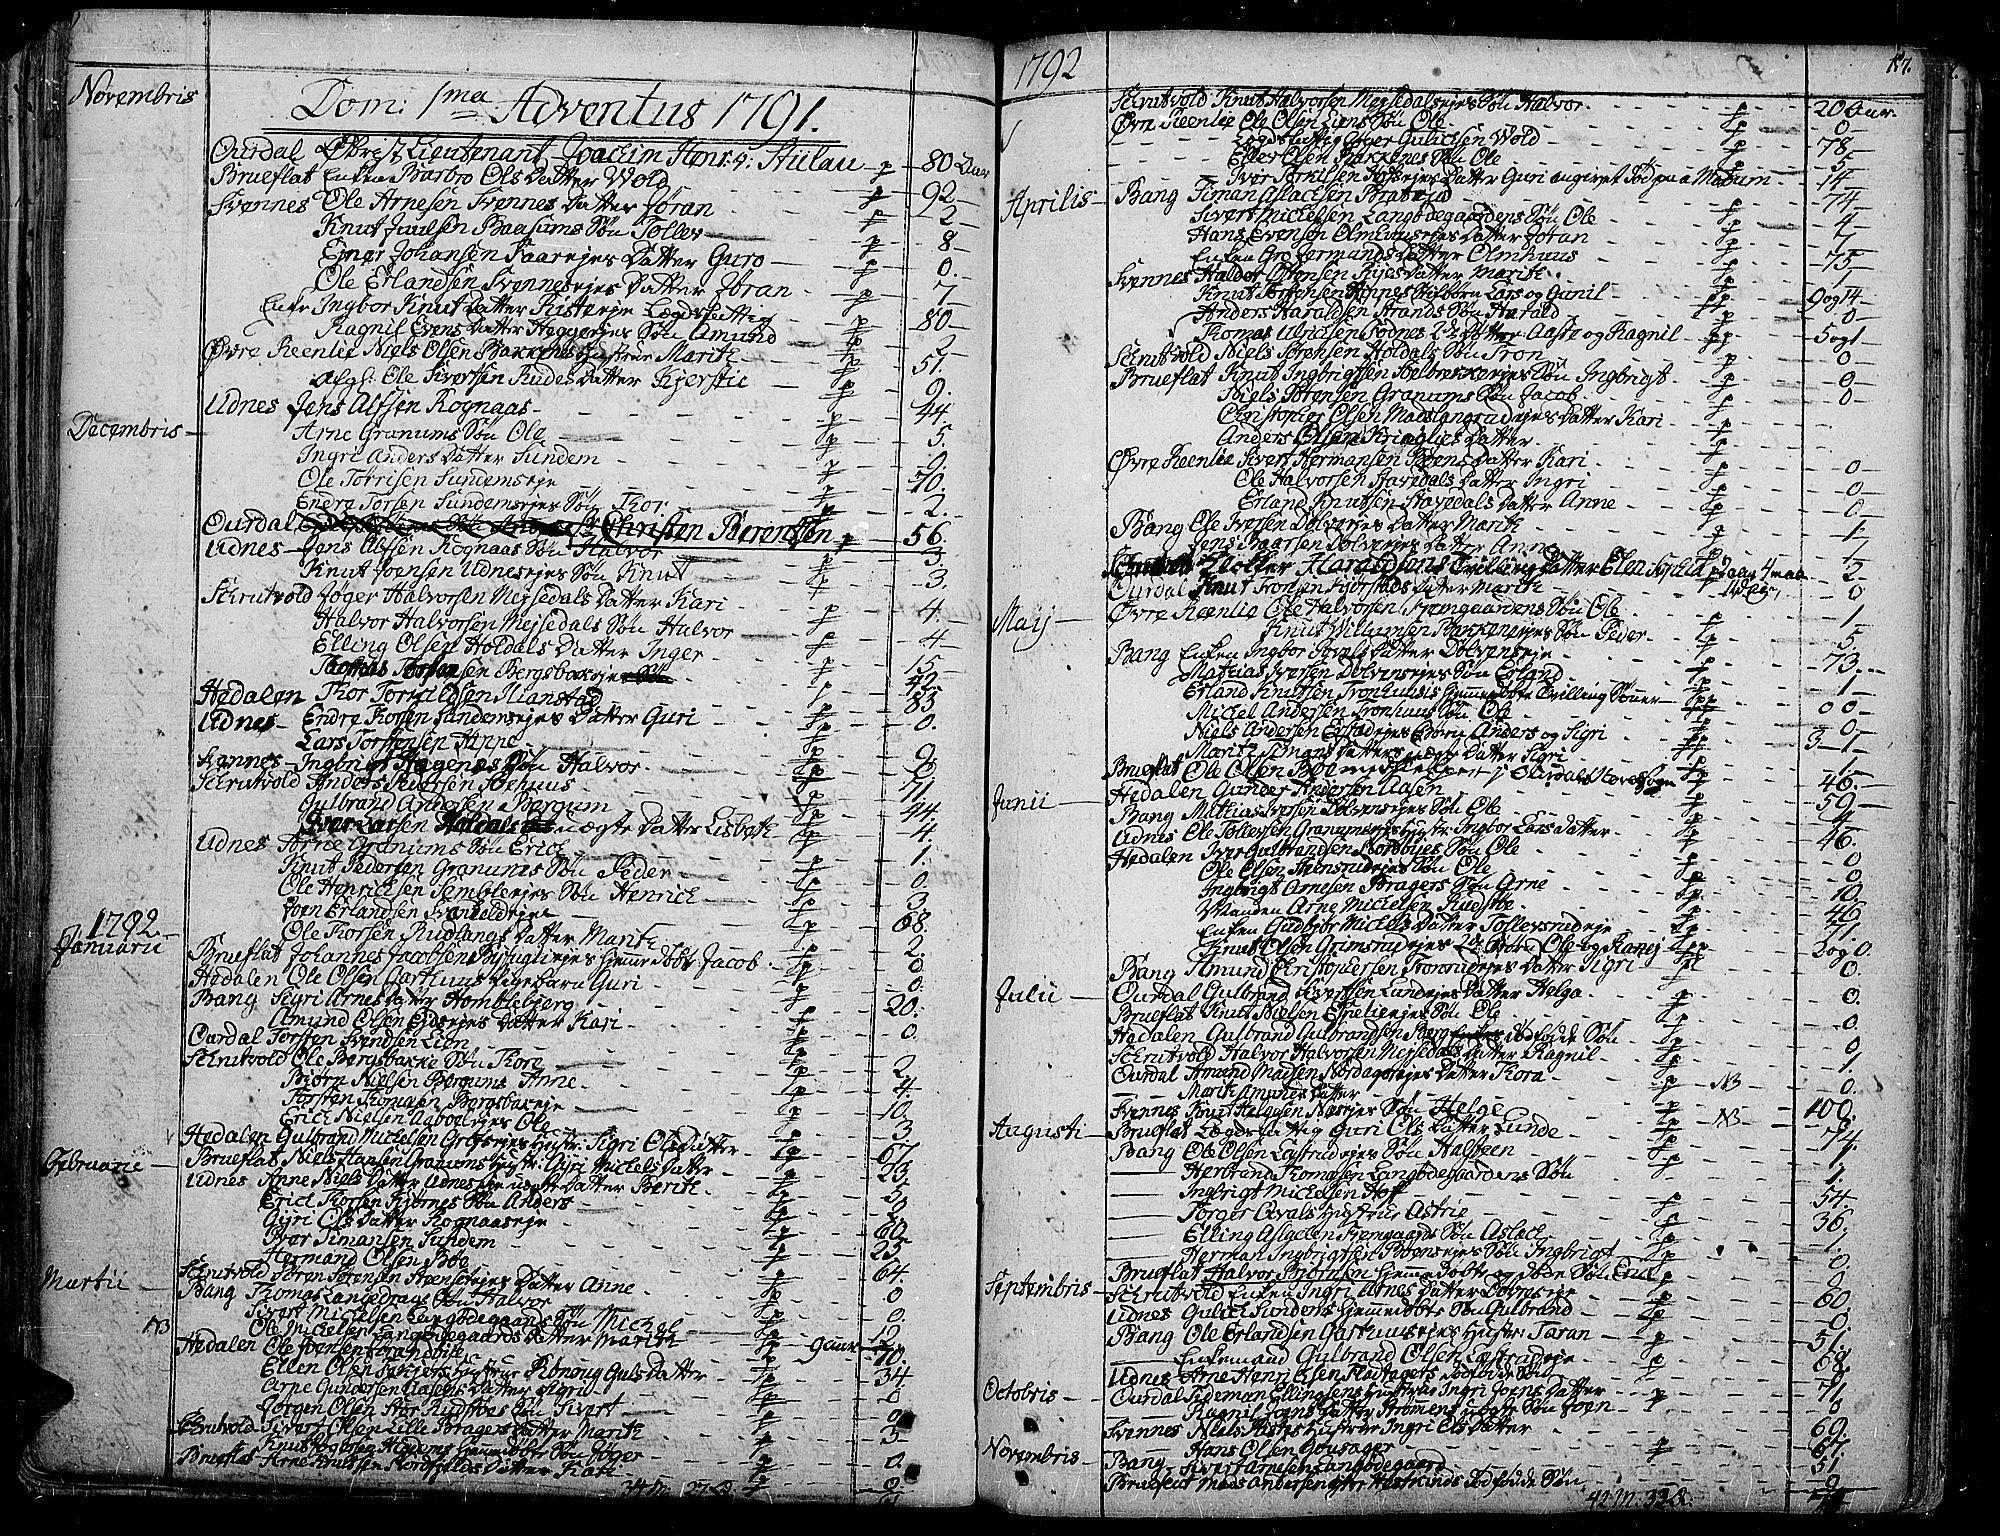 SAH, Aurdal prestekontor, Ministerialbok nr. 6, 1781-1804, s. 157